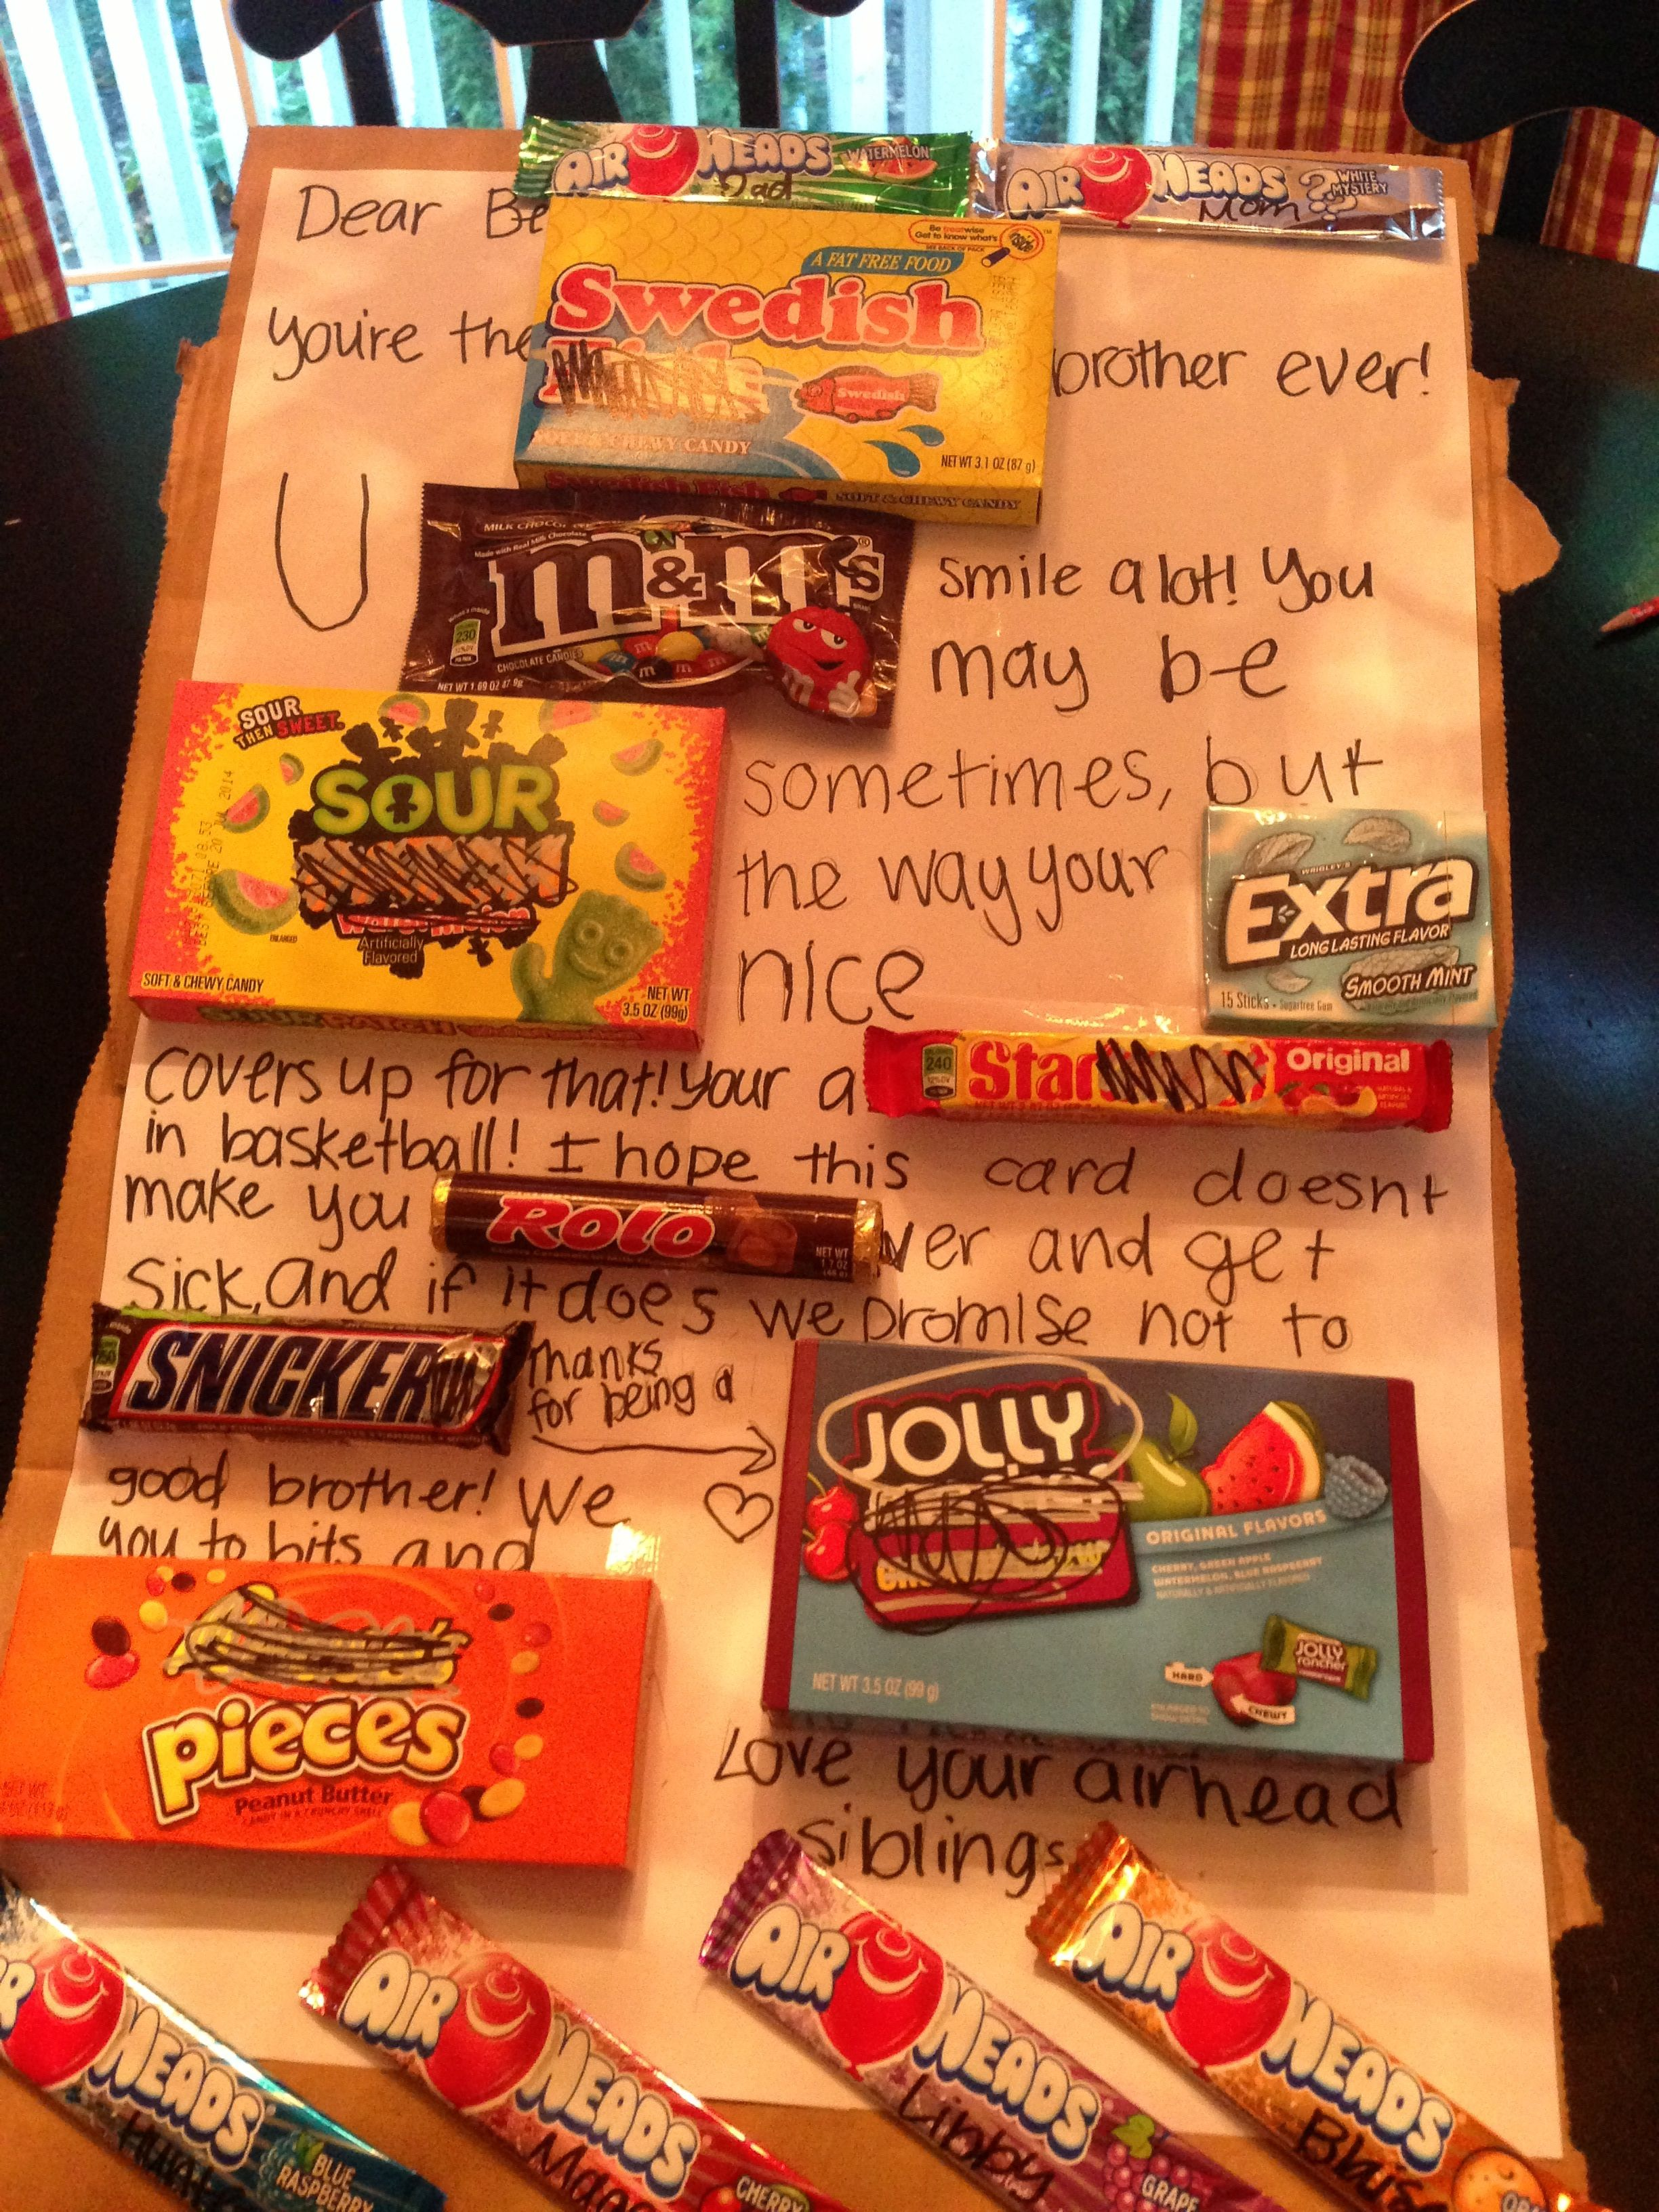 brother birthday present! wypracowanie candies Birthday